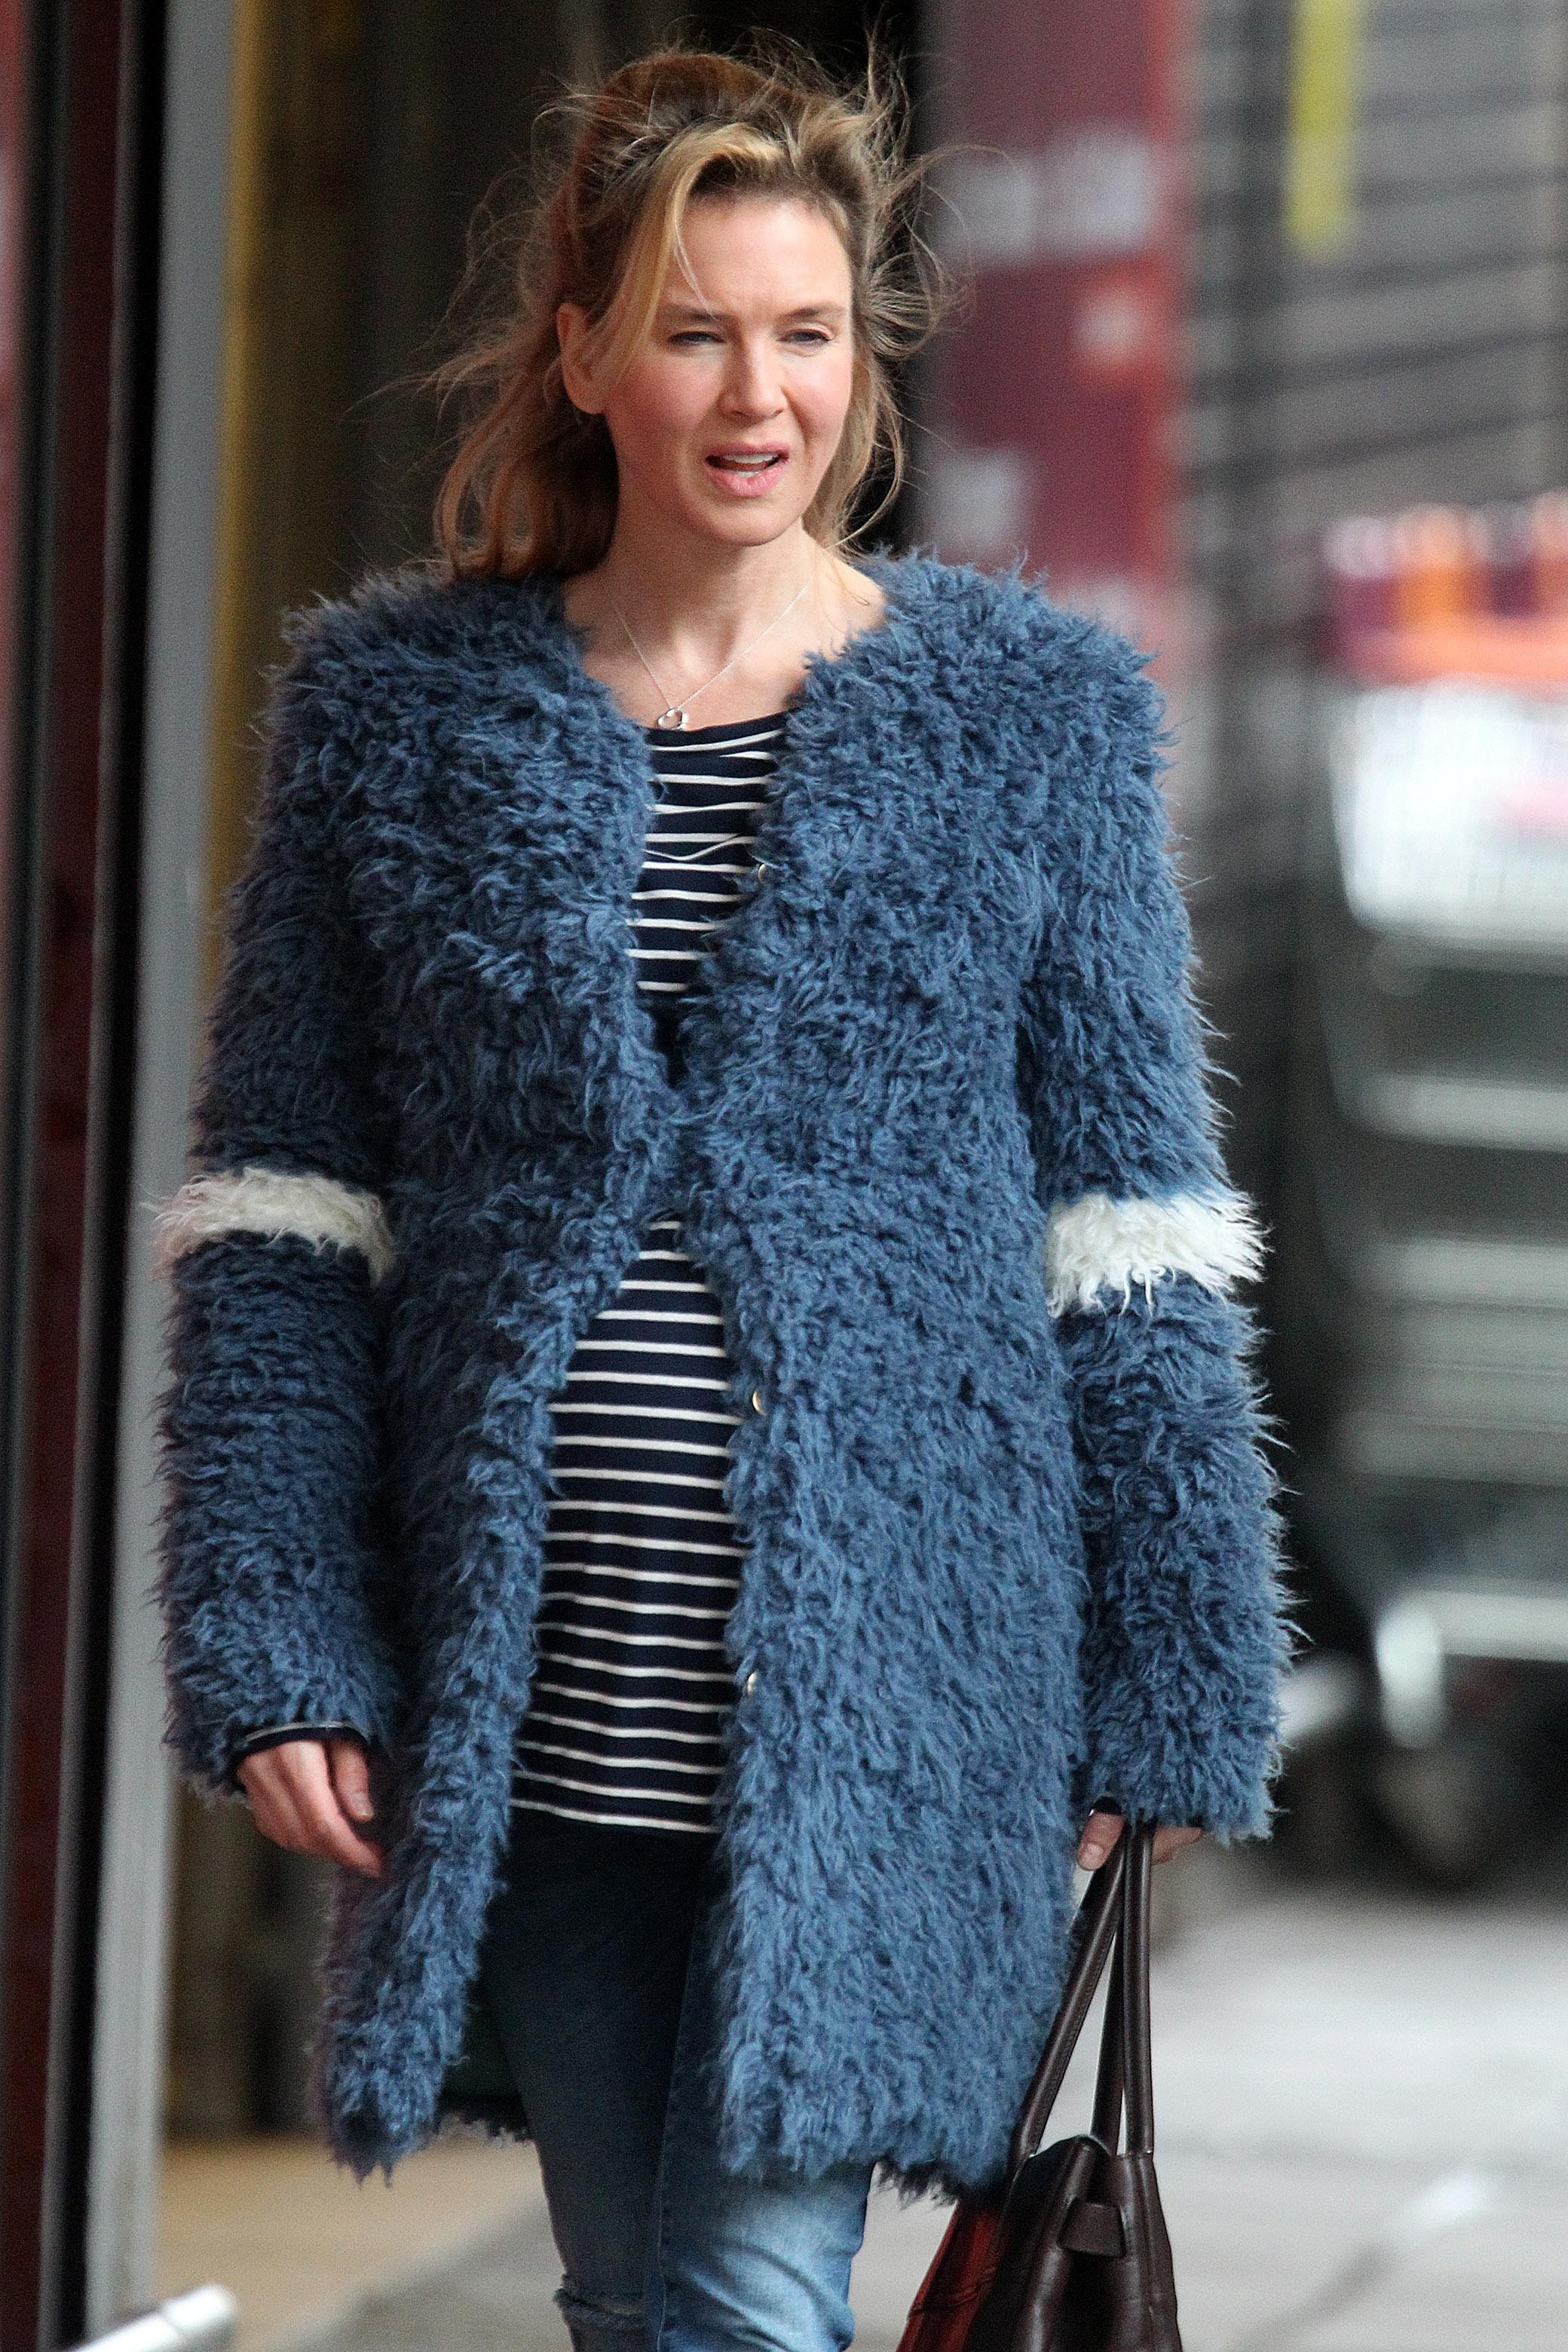 Bridget Jones Diary Renee Zellweger pregnant filmi